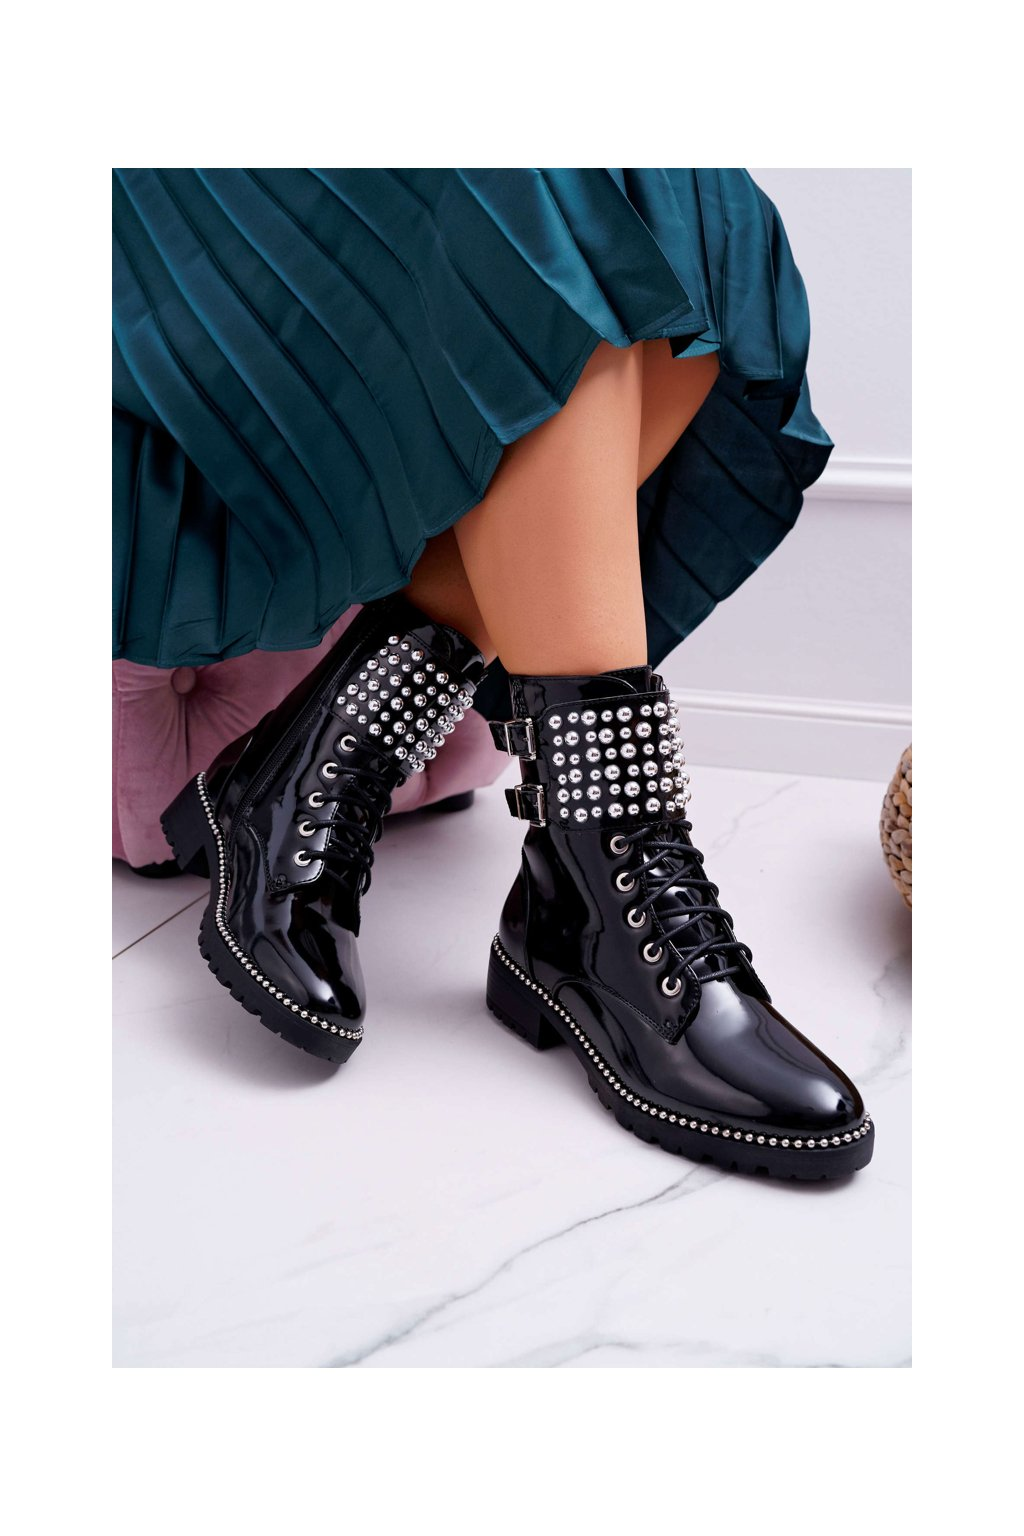 Dámske členkové topánky Military Lakované čierne Bemmer